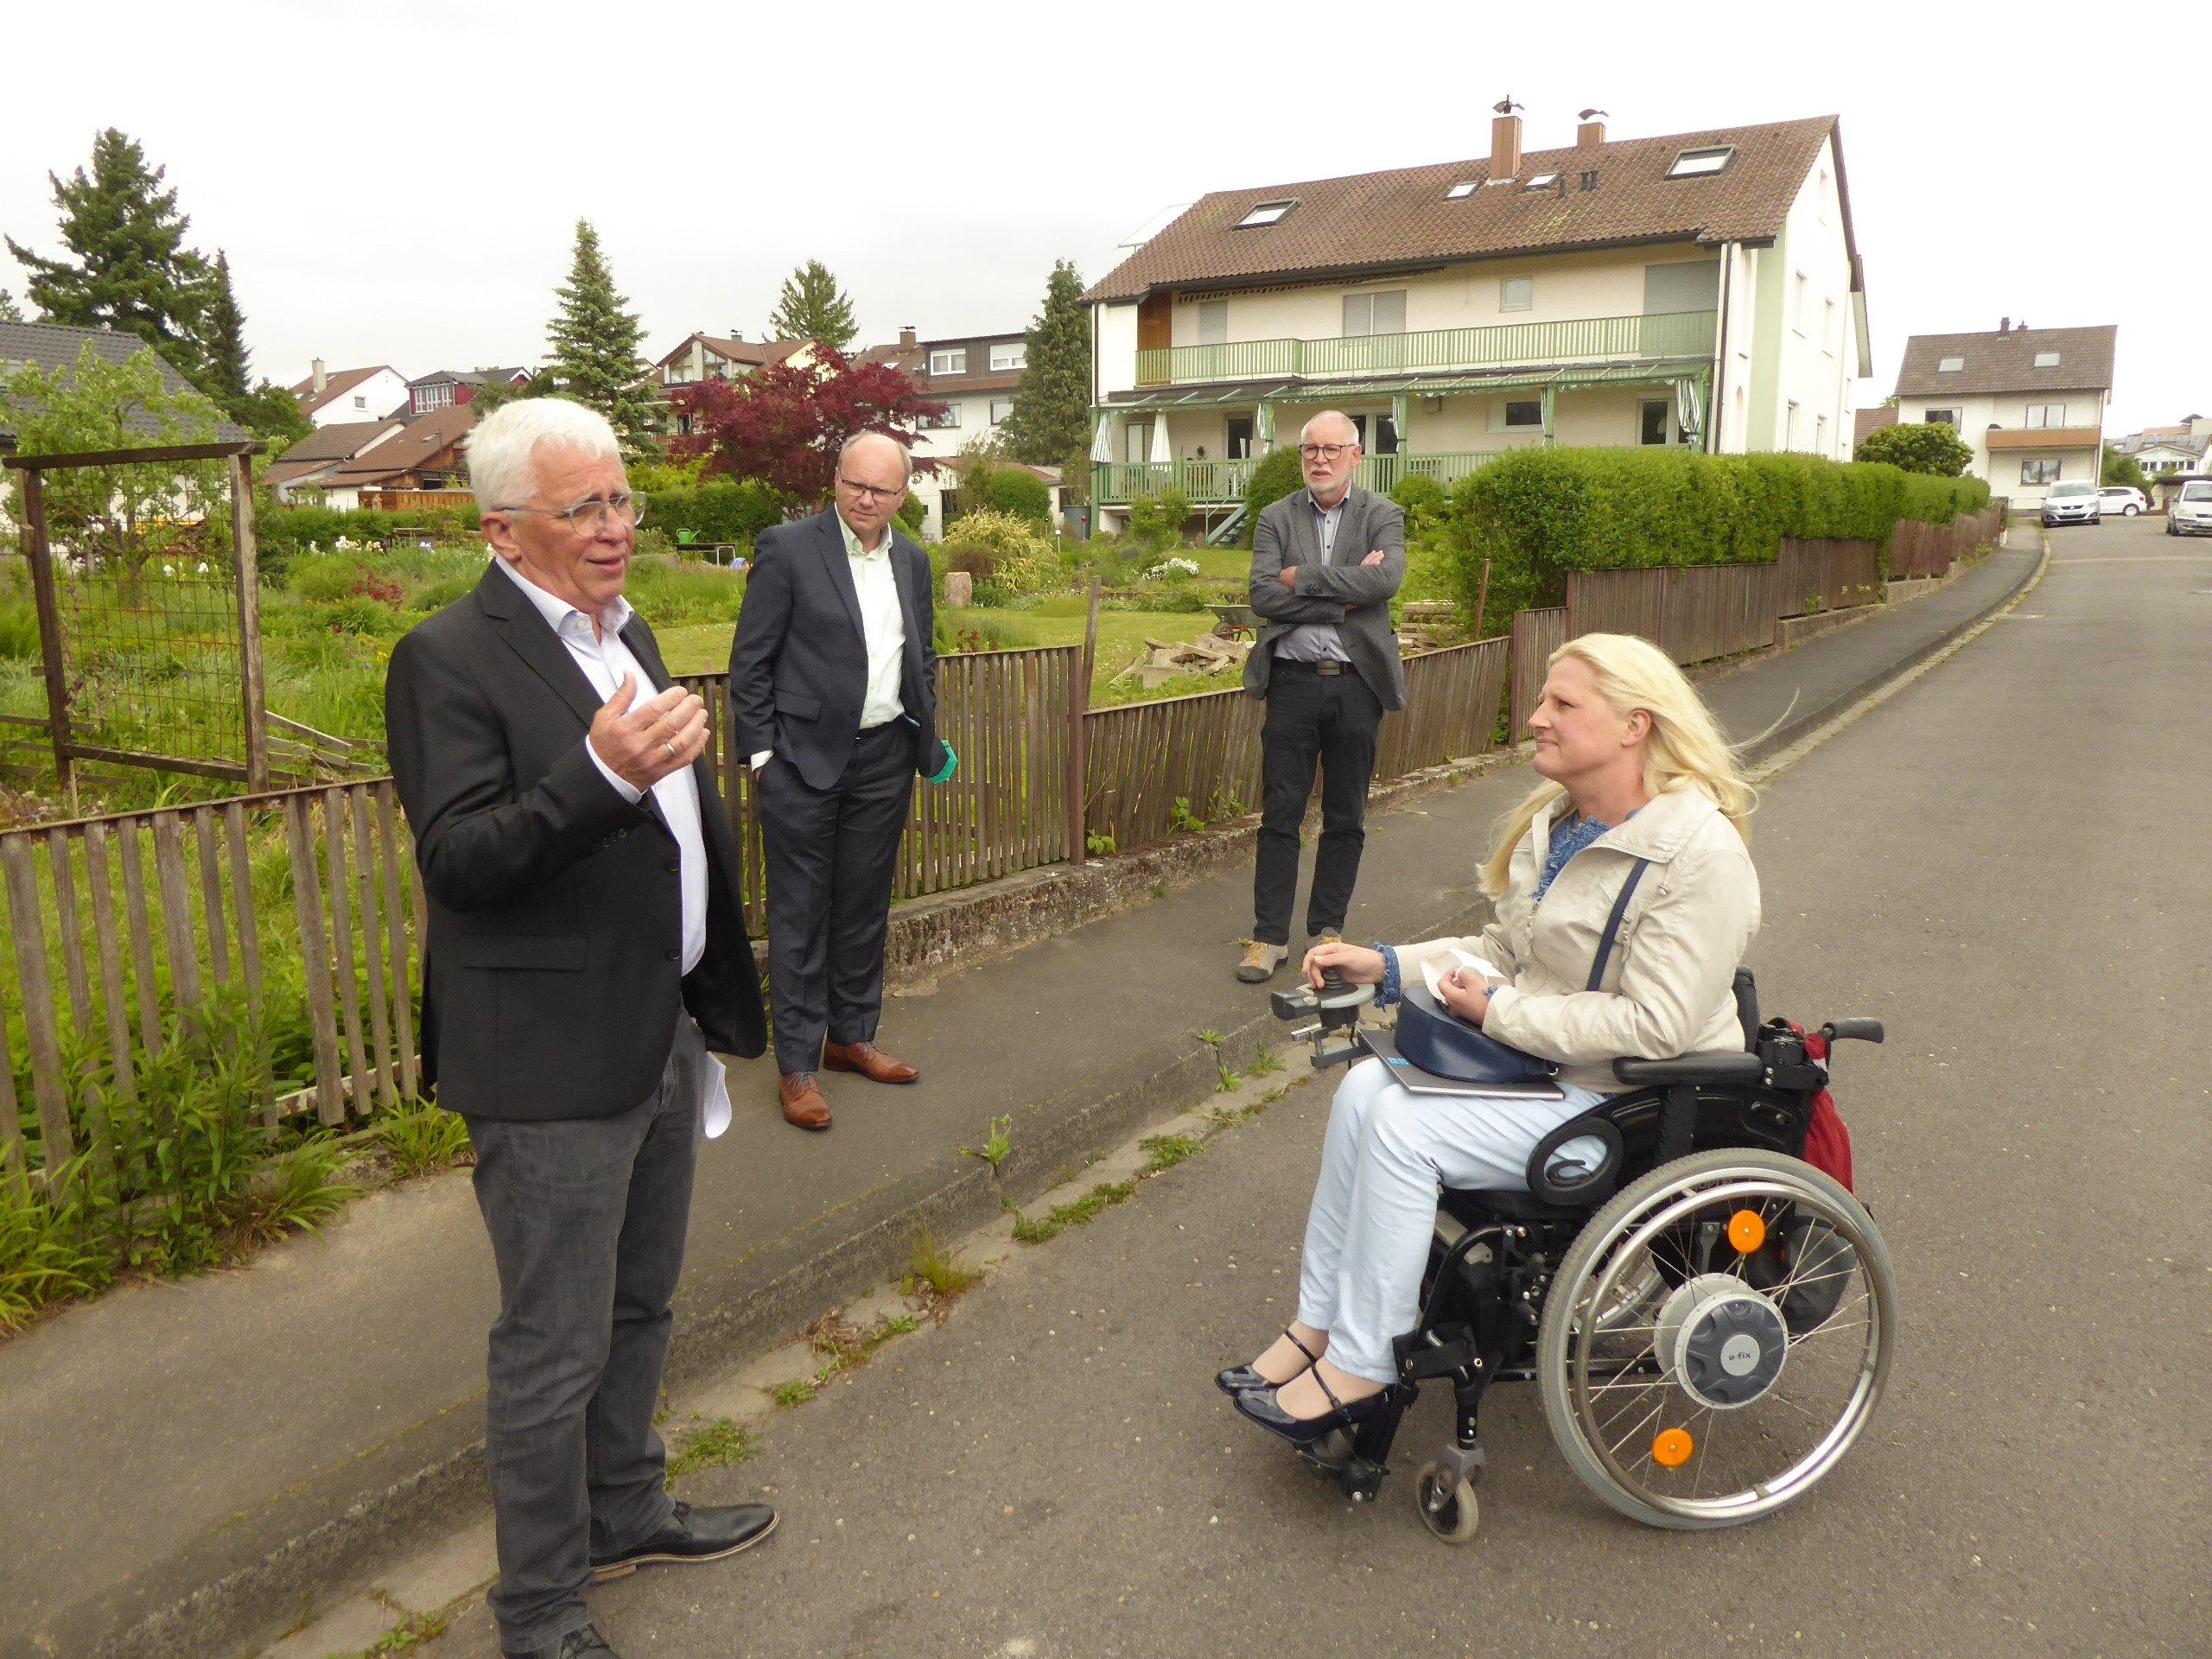 Grüne Bundestags-Kandidatin vor Ort in Remchingen